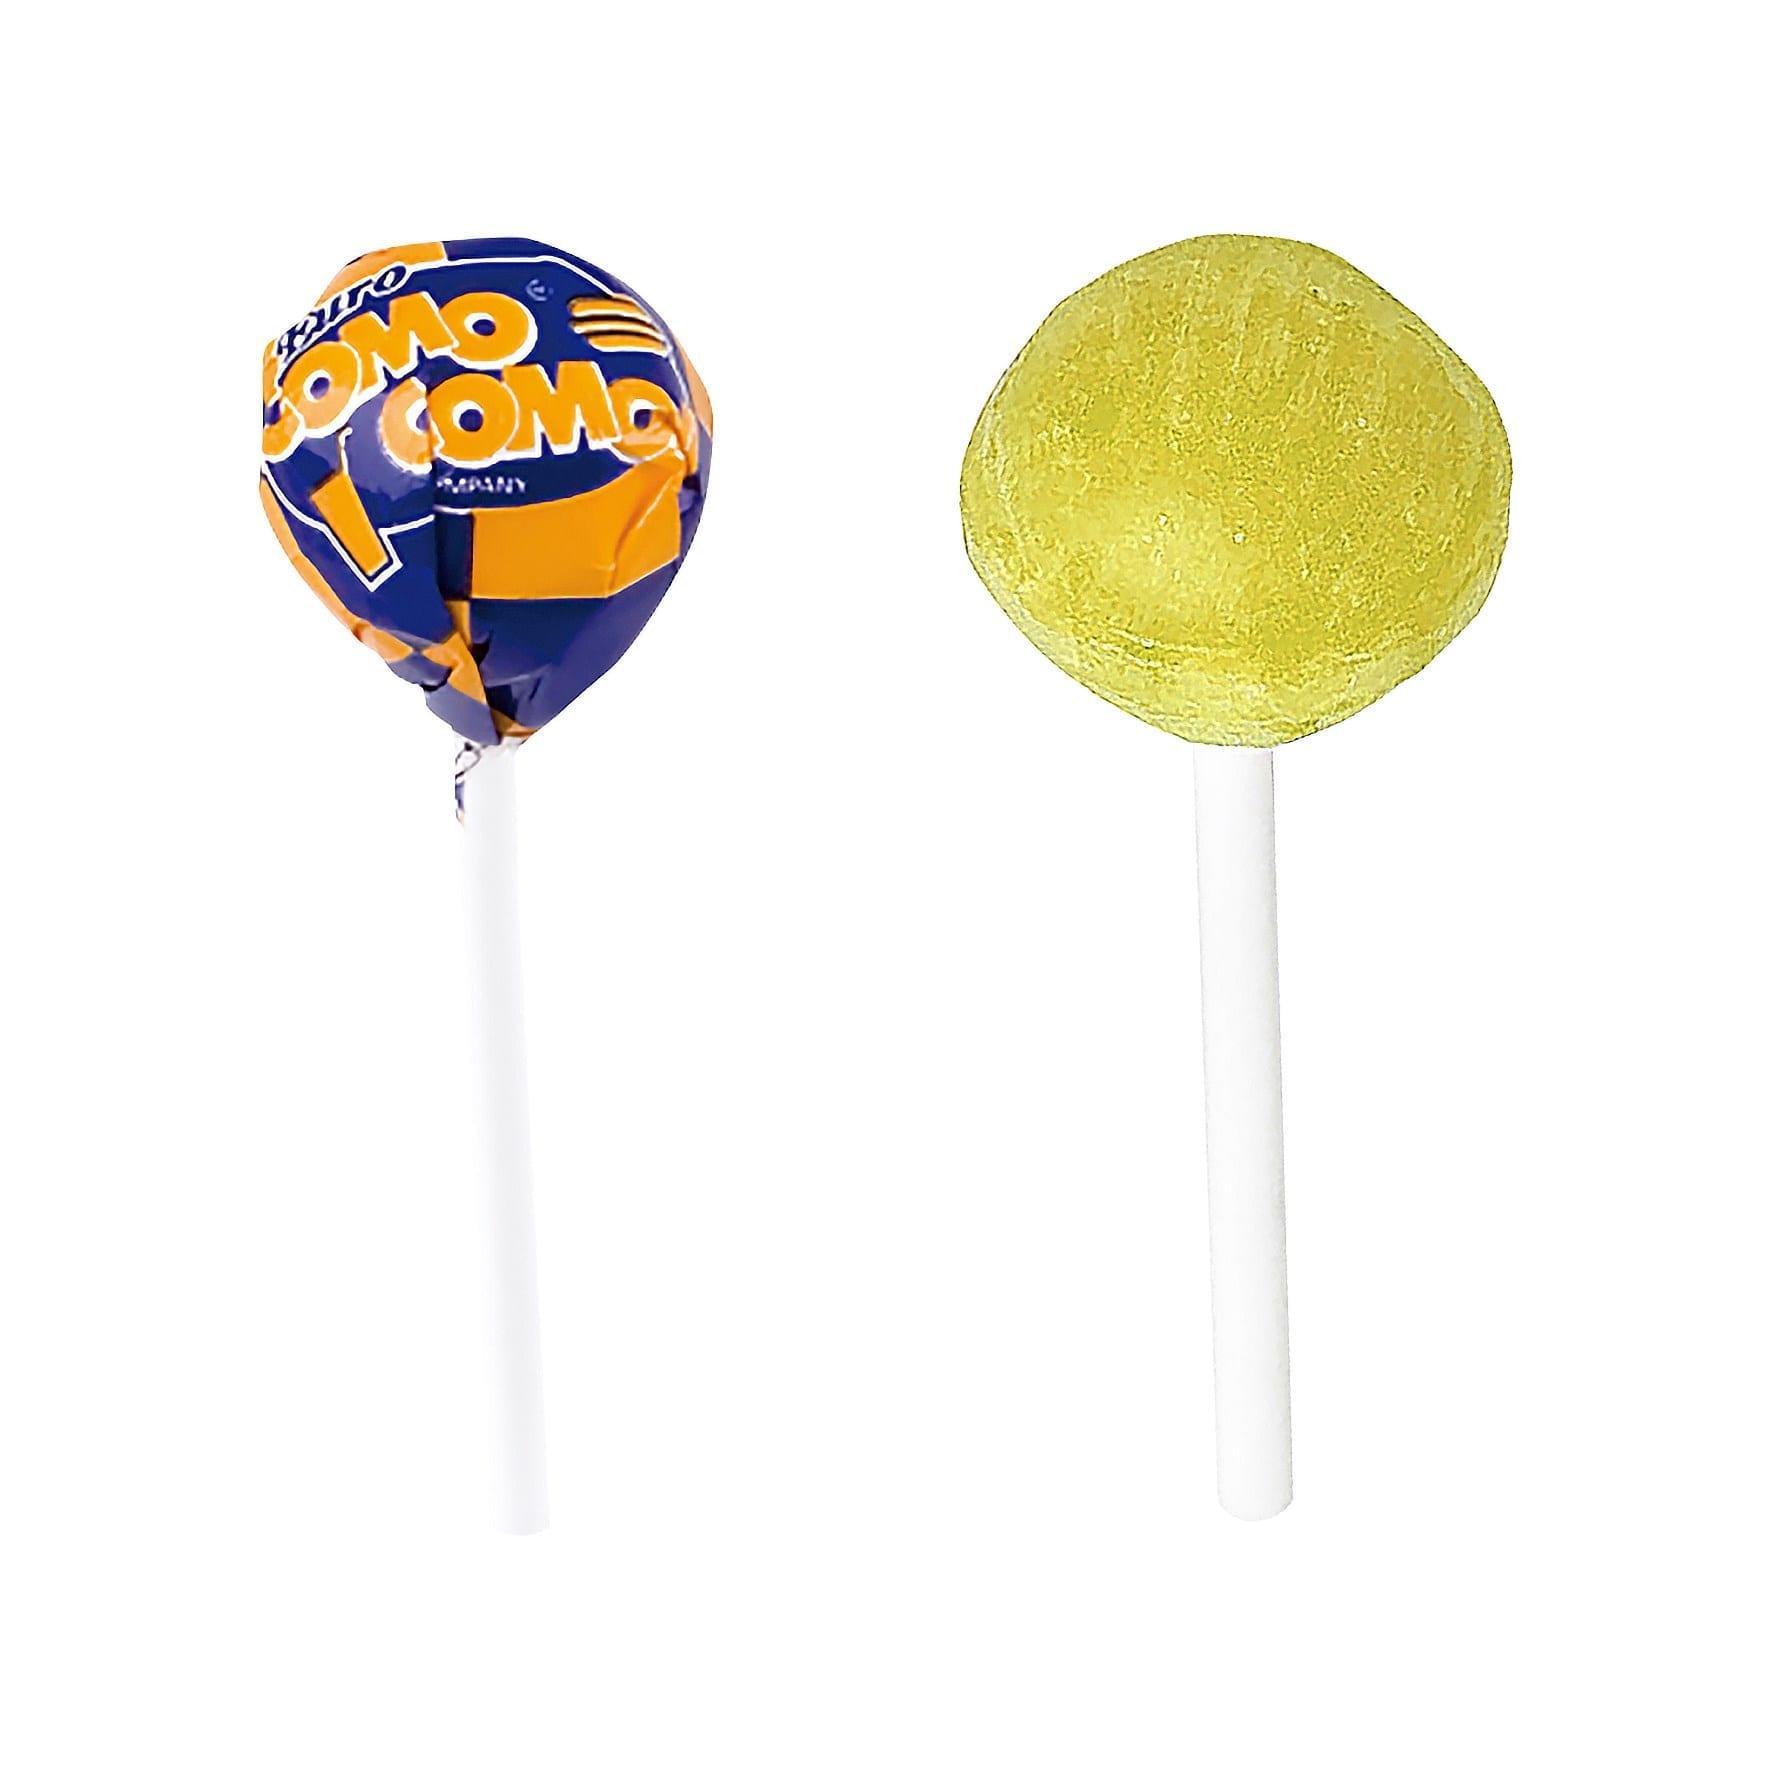 Flavoured ball lollipop